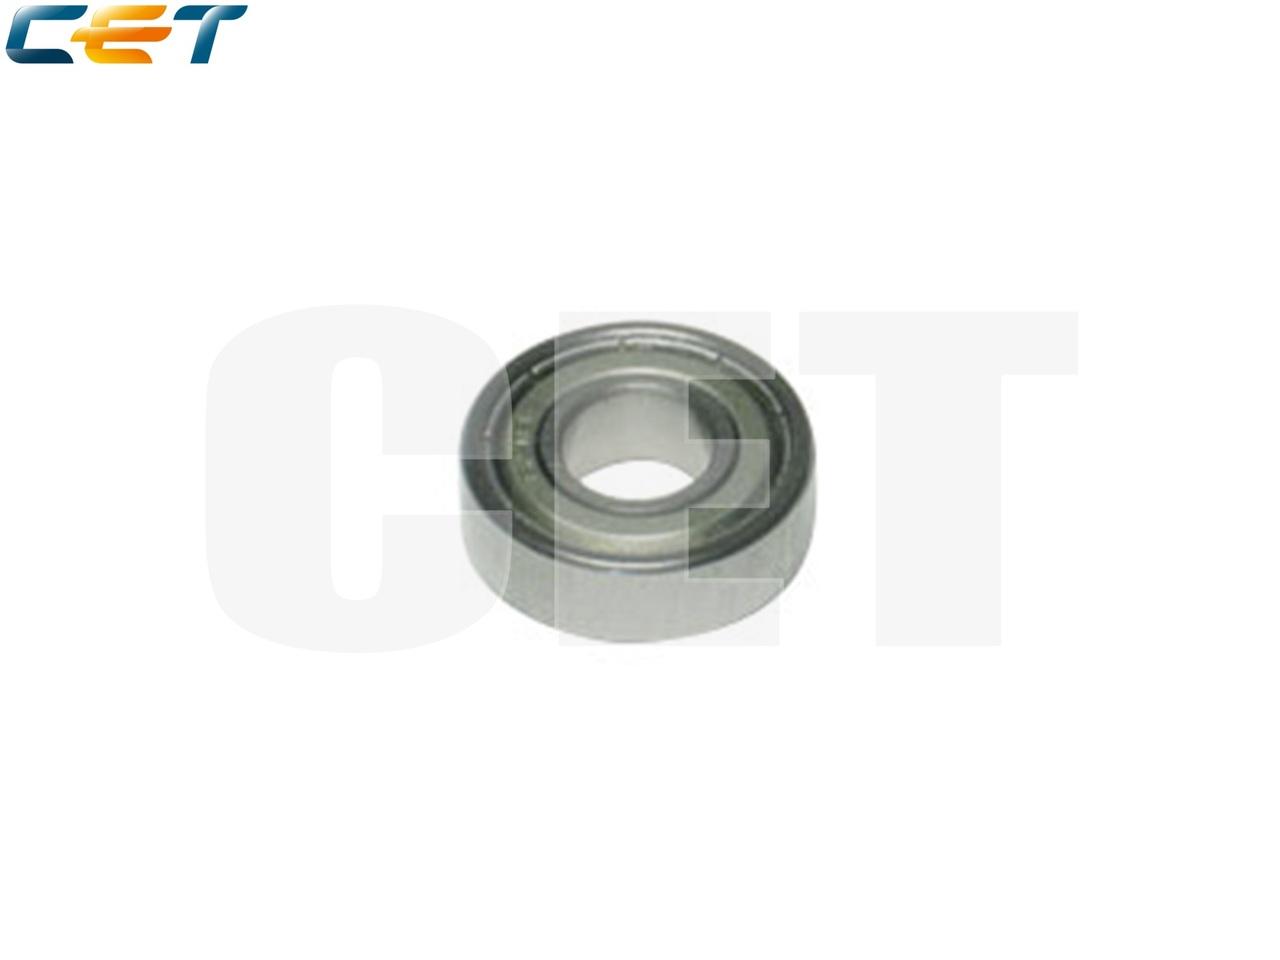 Подшипник резинового вала AE03-0030 для RICOH Aficio1015/1018, KYOCERA KM-3035/4035/5035 (CET), 2 шт/компл,CET6127